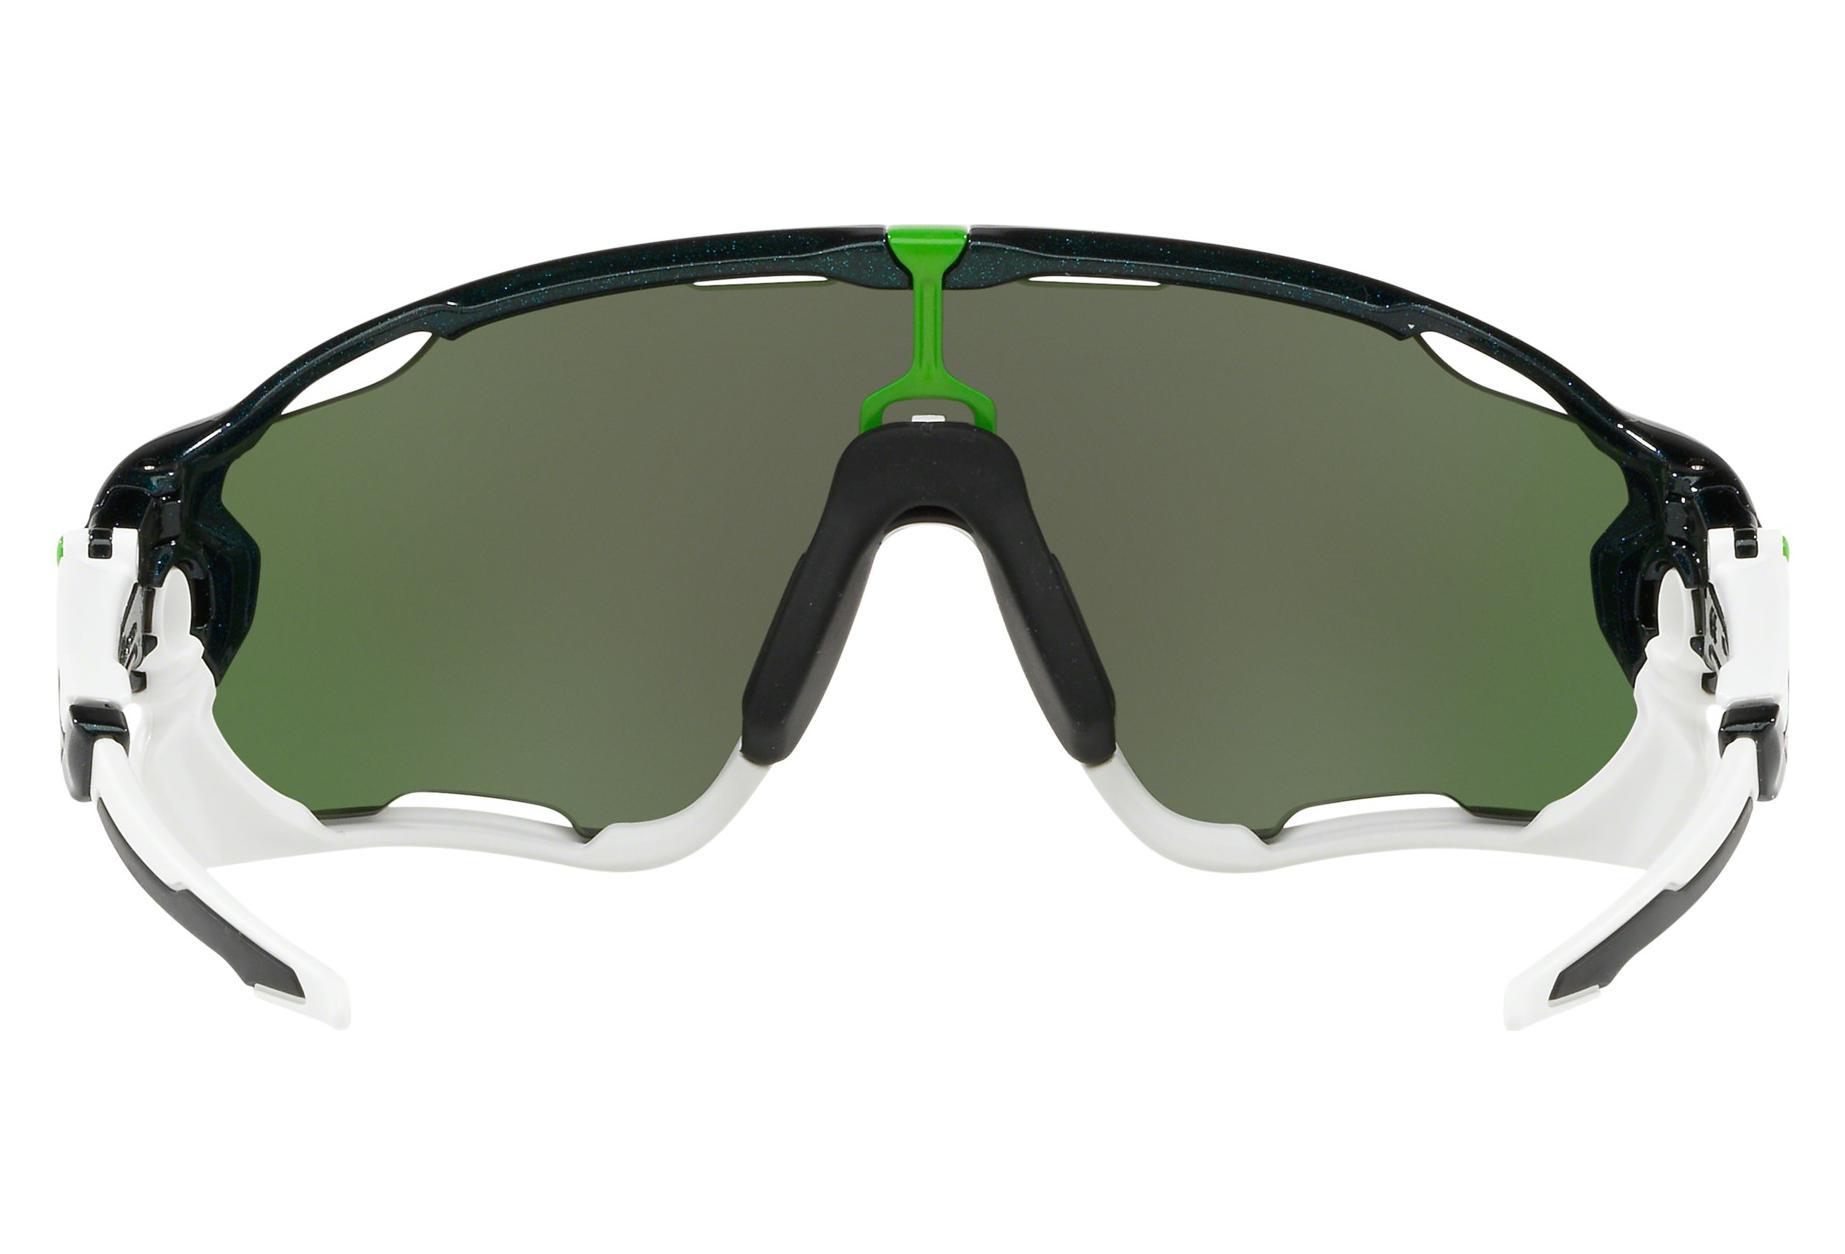 28a87040e7 OAKLEY Sunglasses Jawbreaker CAVENDISH Edition Mettalic Green Prizm Jade  Ref OO9290-3631